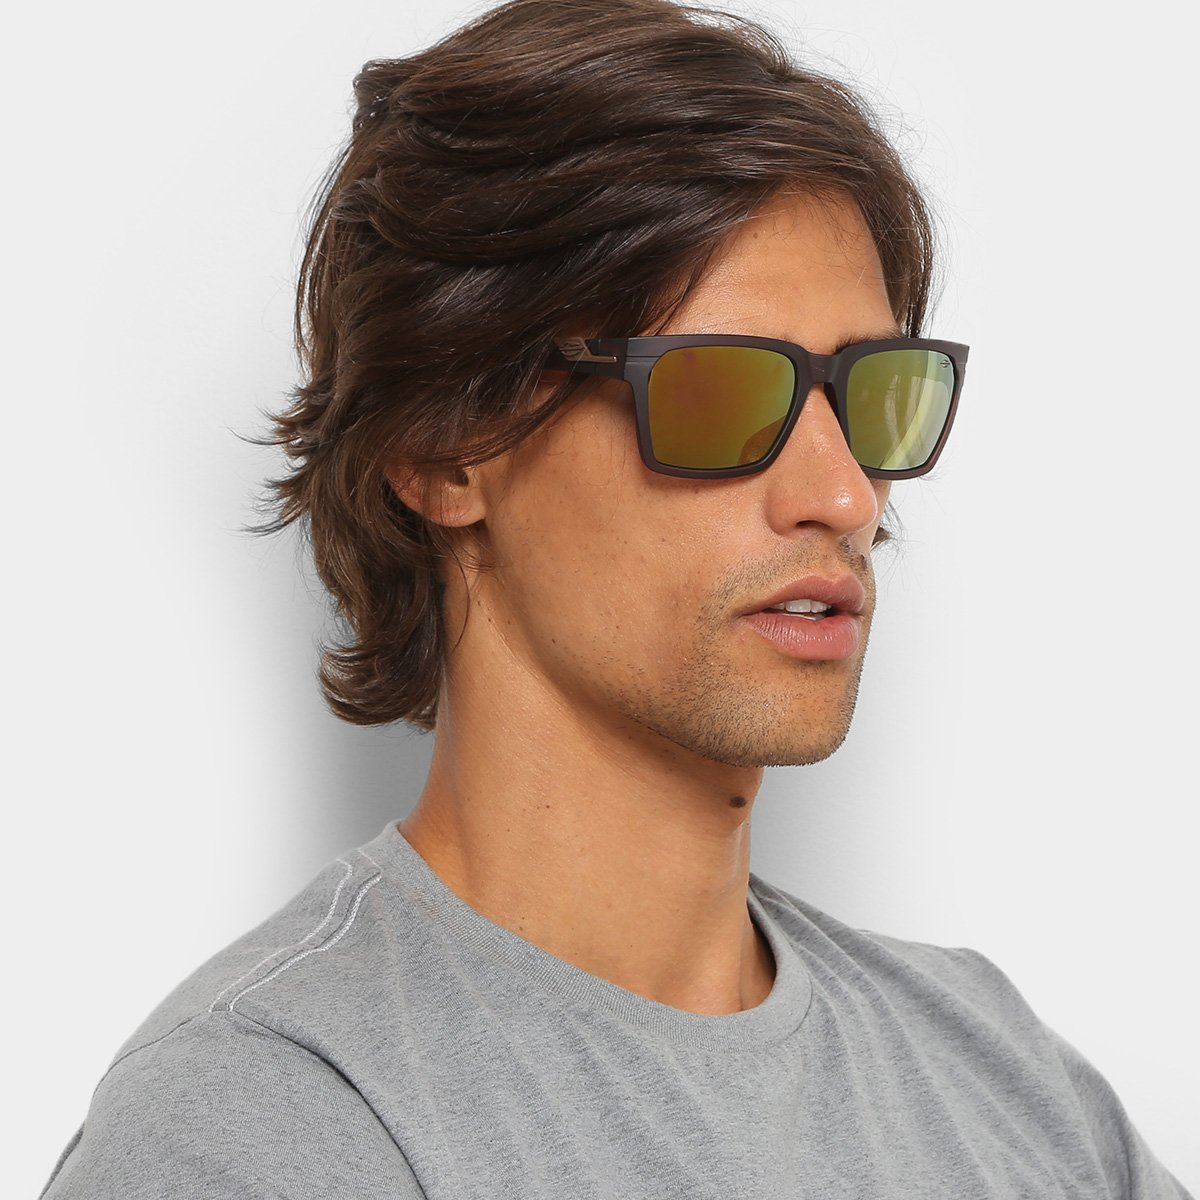 a22967dd114f6 Óculos de Sol Mormaii M0057J5596 Las Vegas Masculino - Vermelho ...